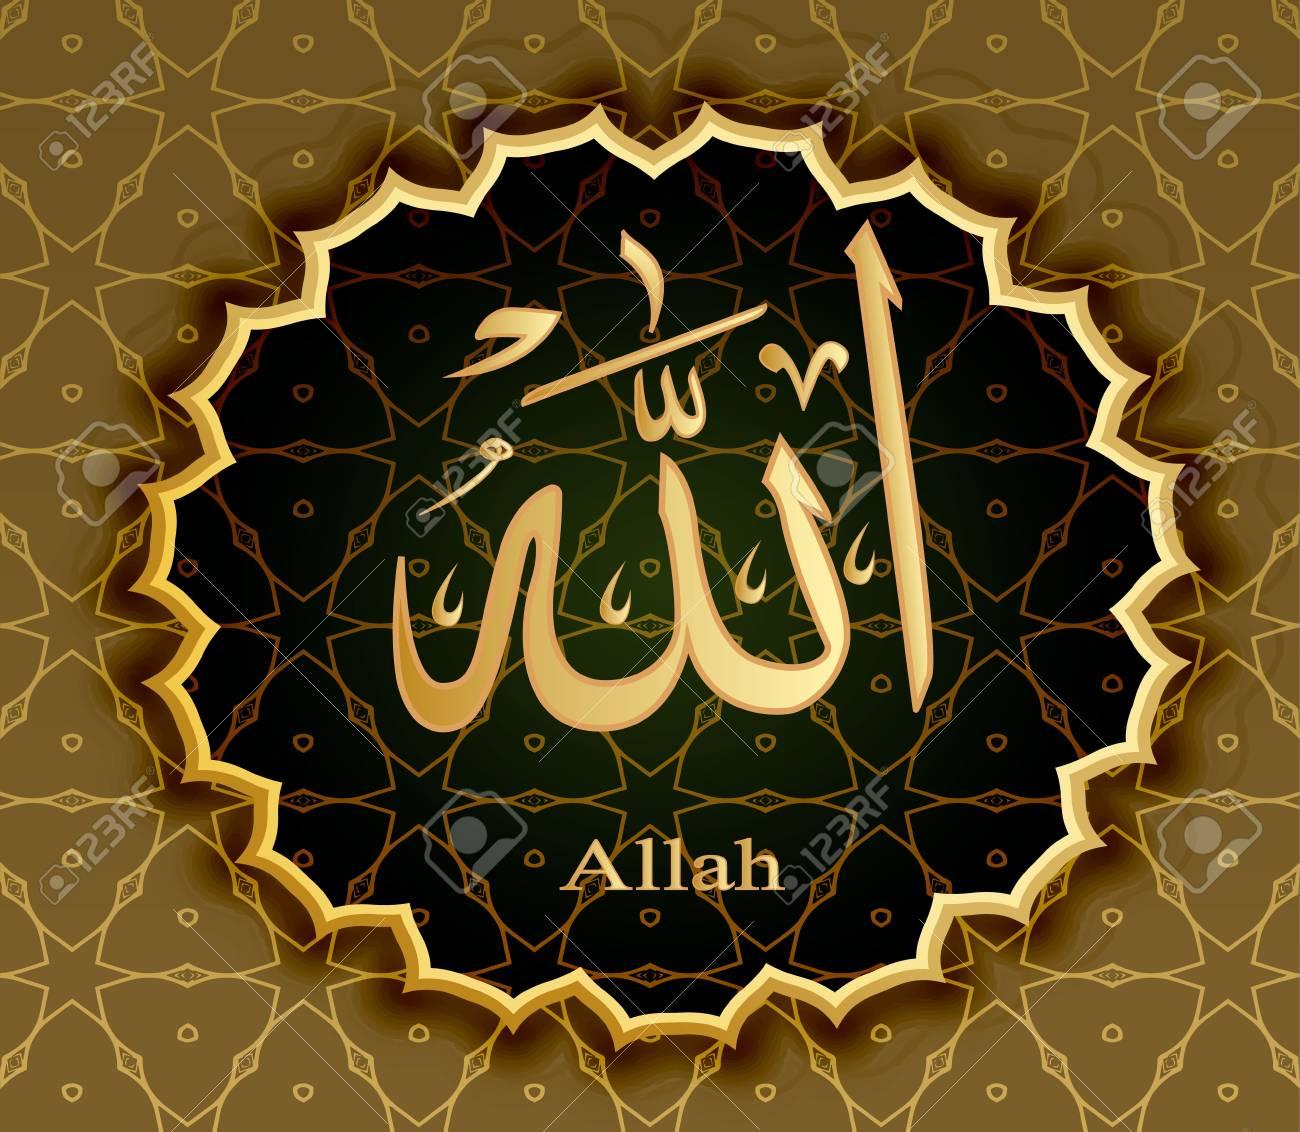 The Name Of Allah Allah. - 110774162